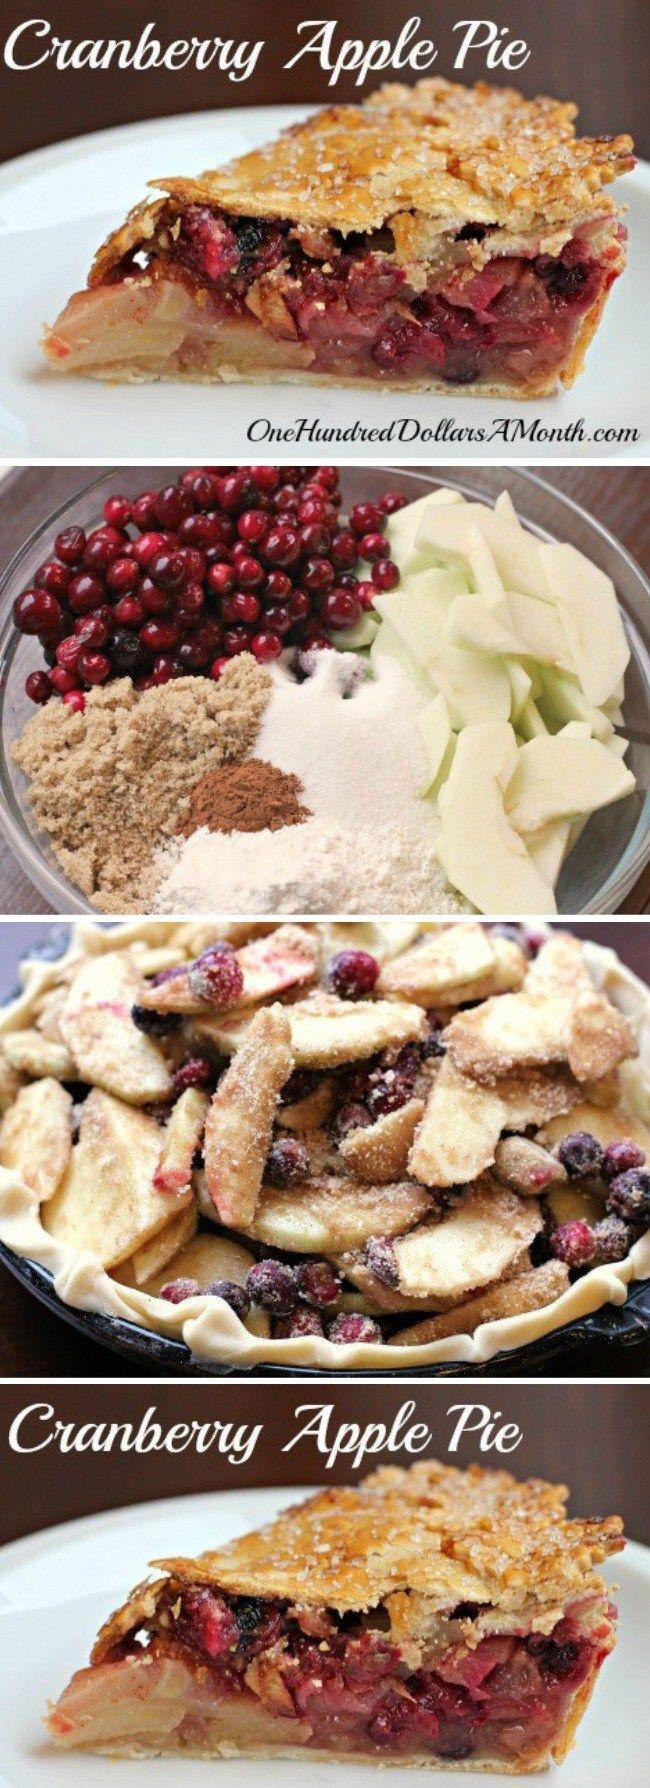 Thanksgiving Dessert Recipes - Cranberry Apple Pie #applepie